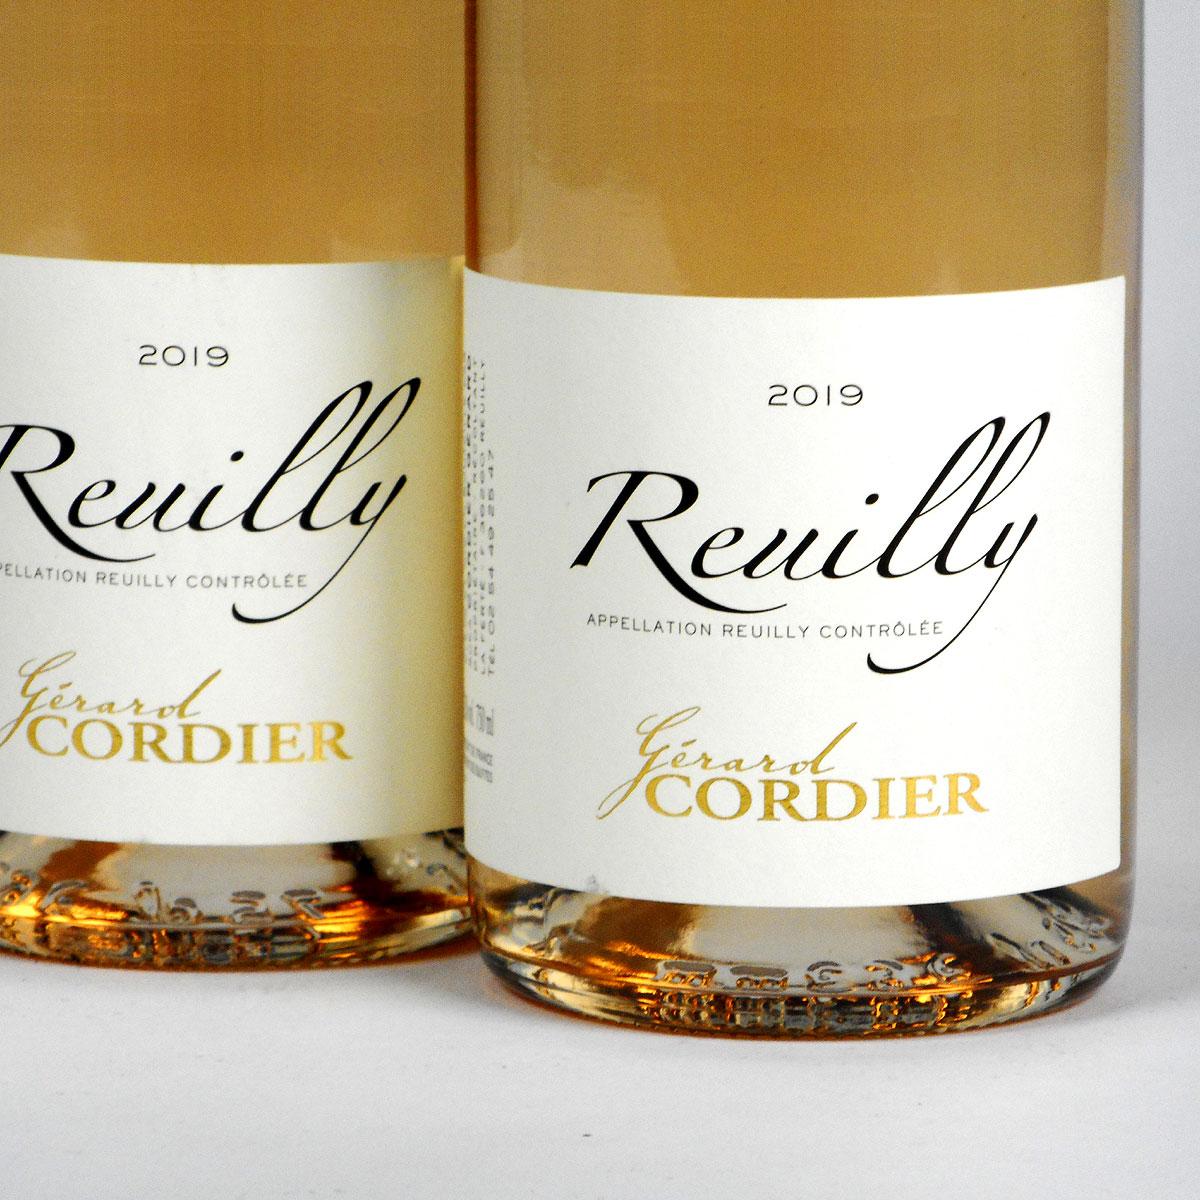 Reuilly: Gerard Cordier Pinot Gris 2019